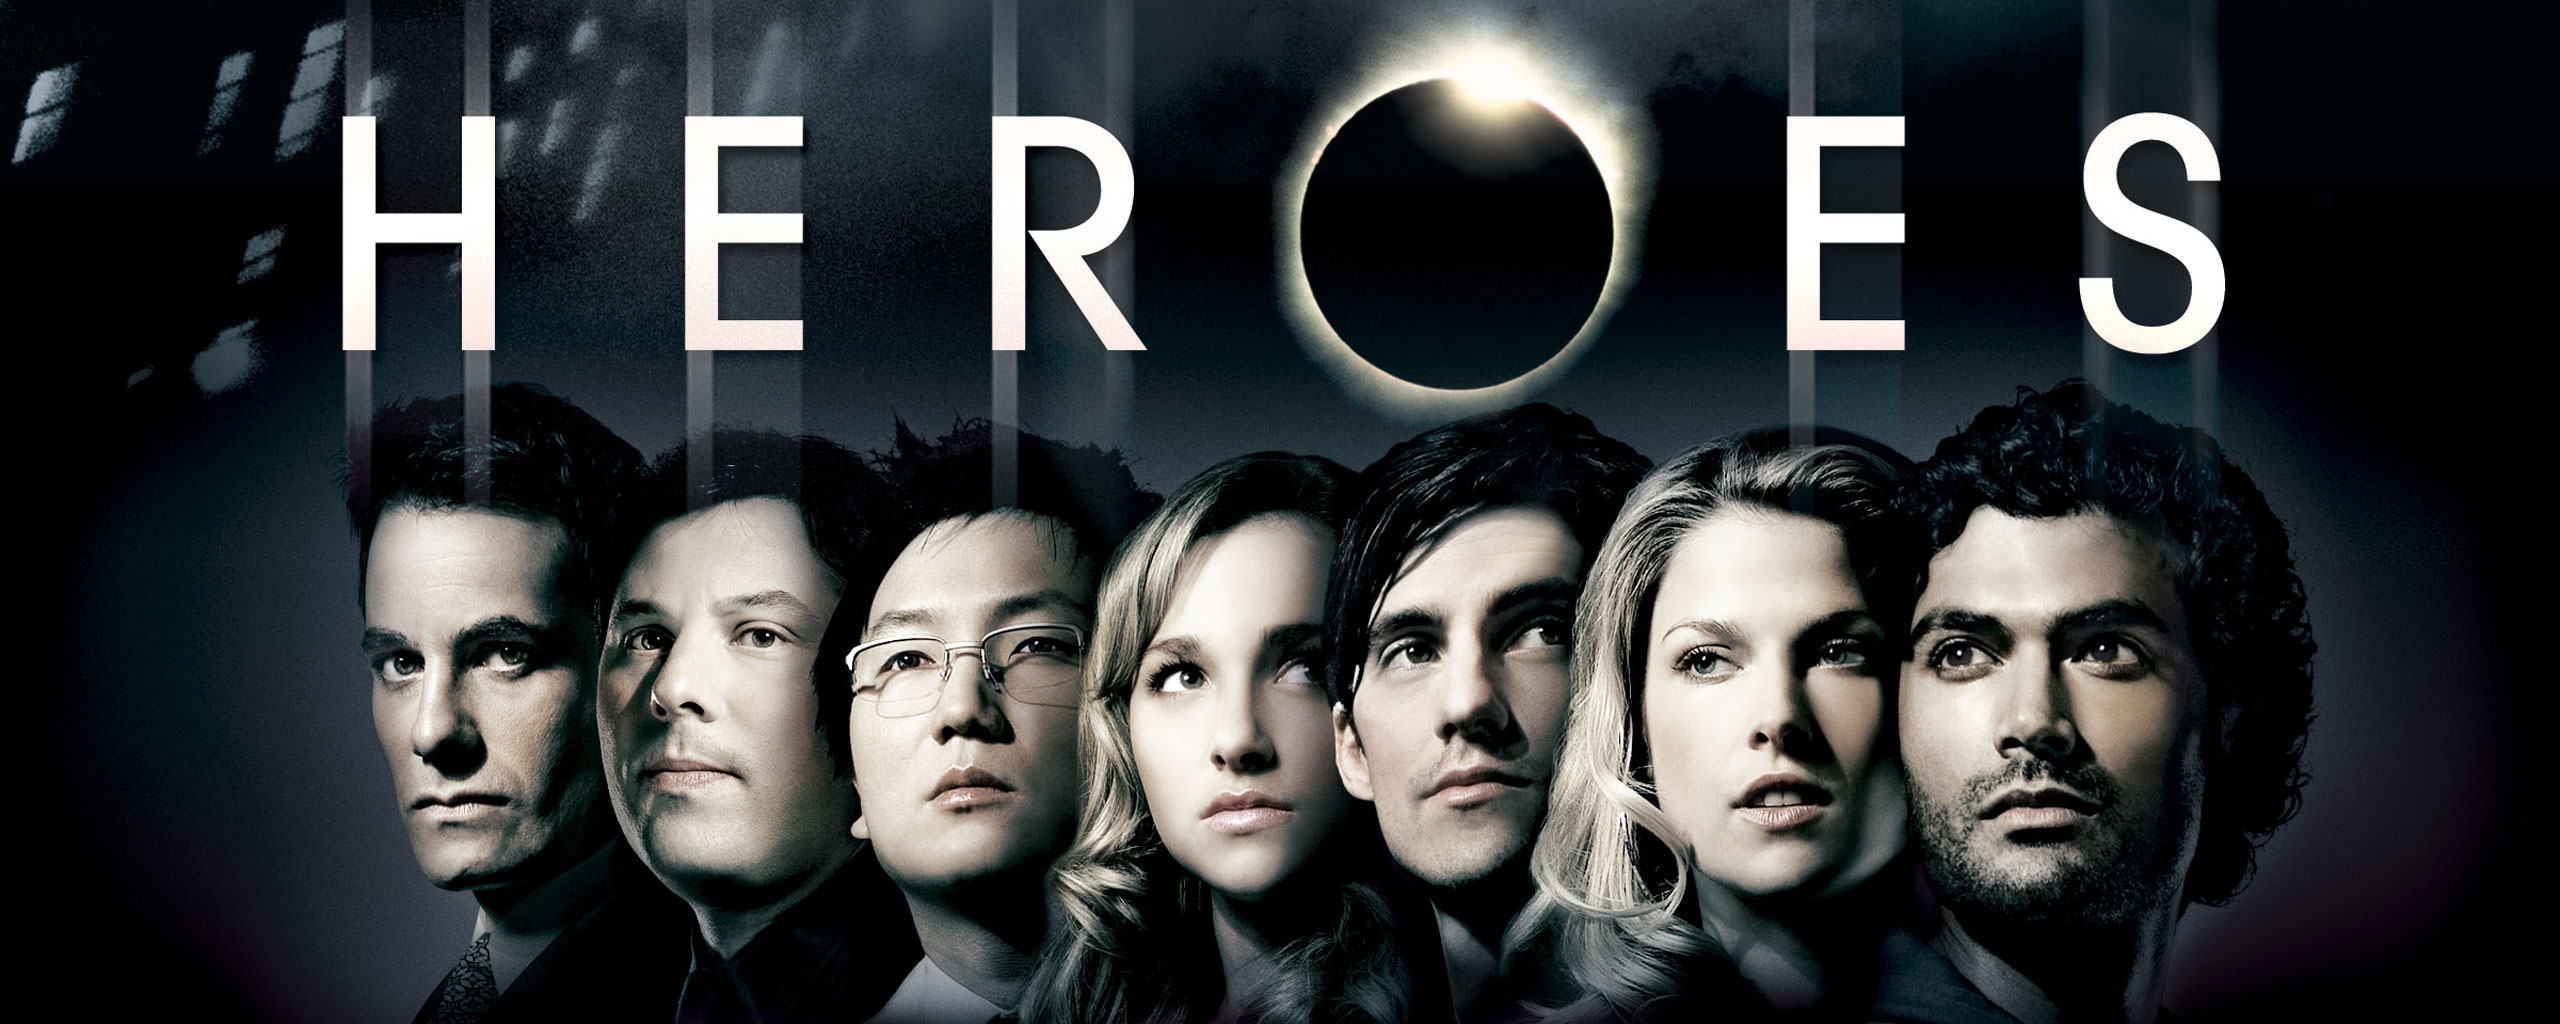 5 Superhero Tv Shows You Should Watch Hodderscape